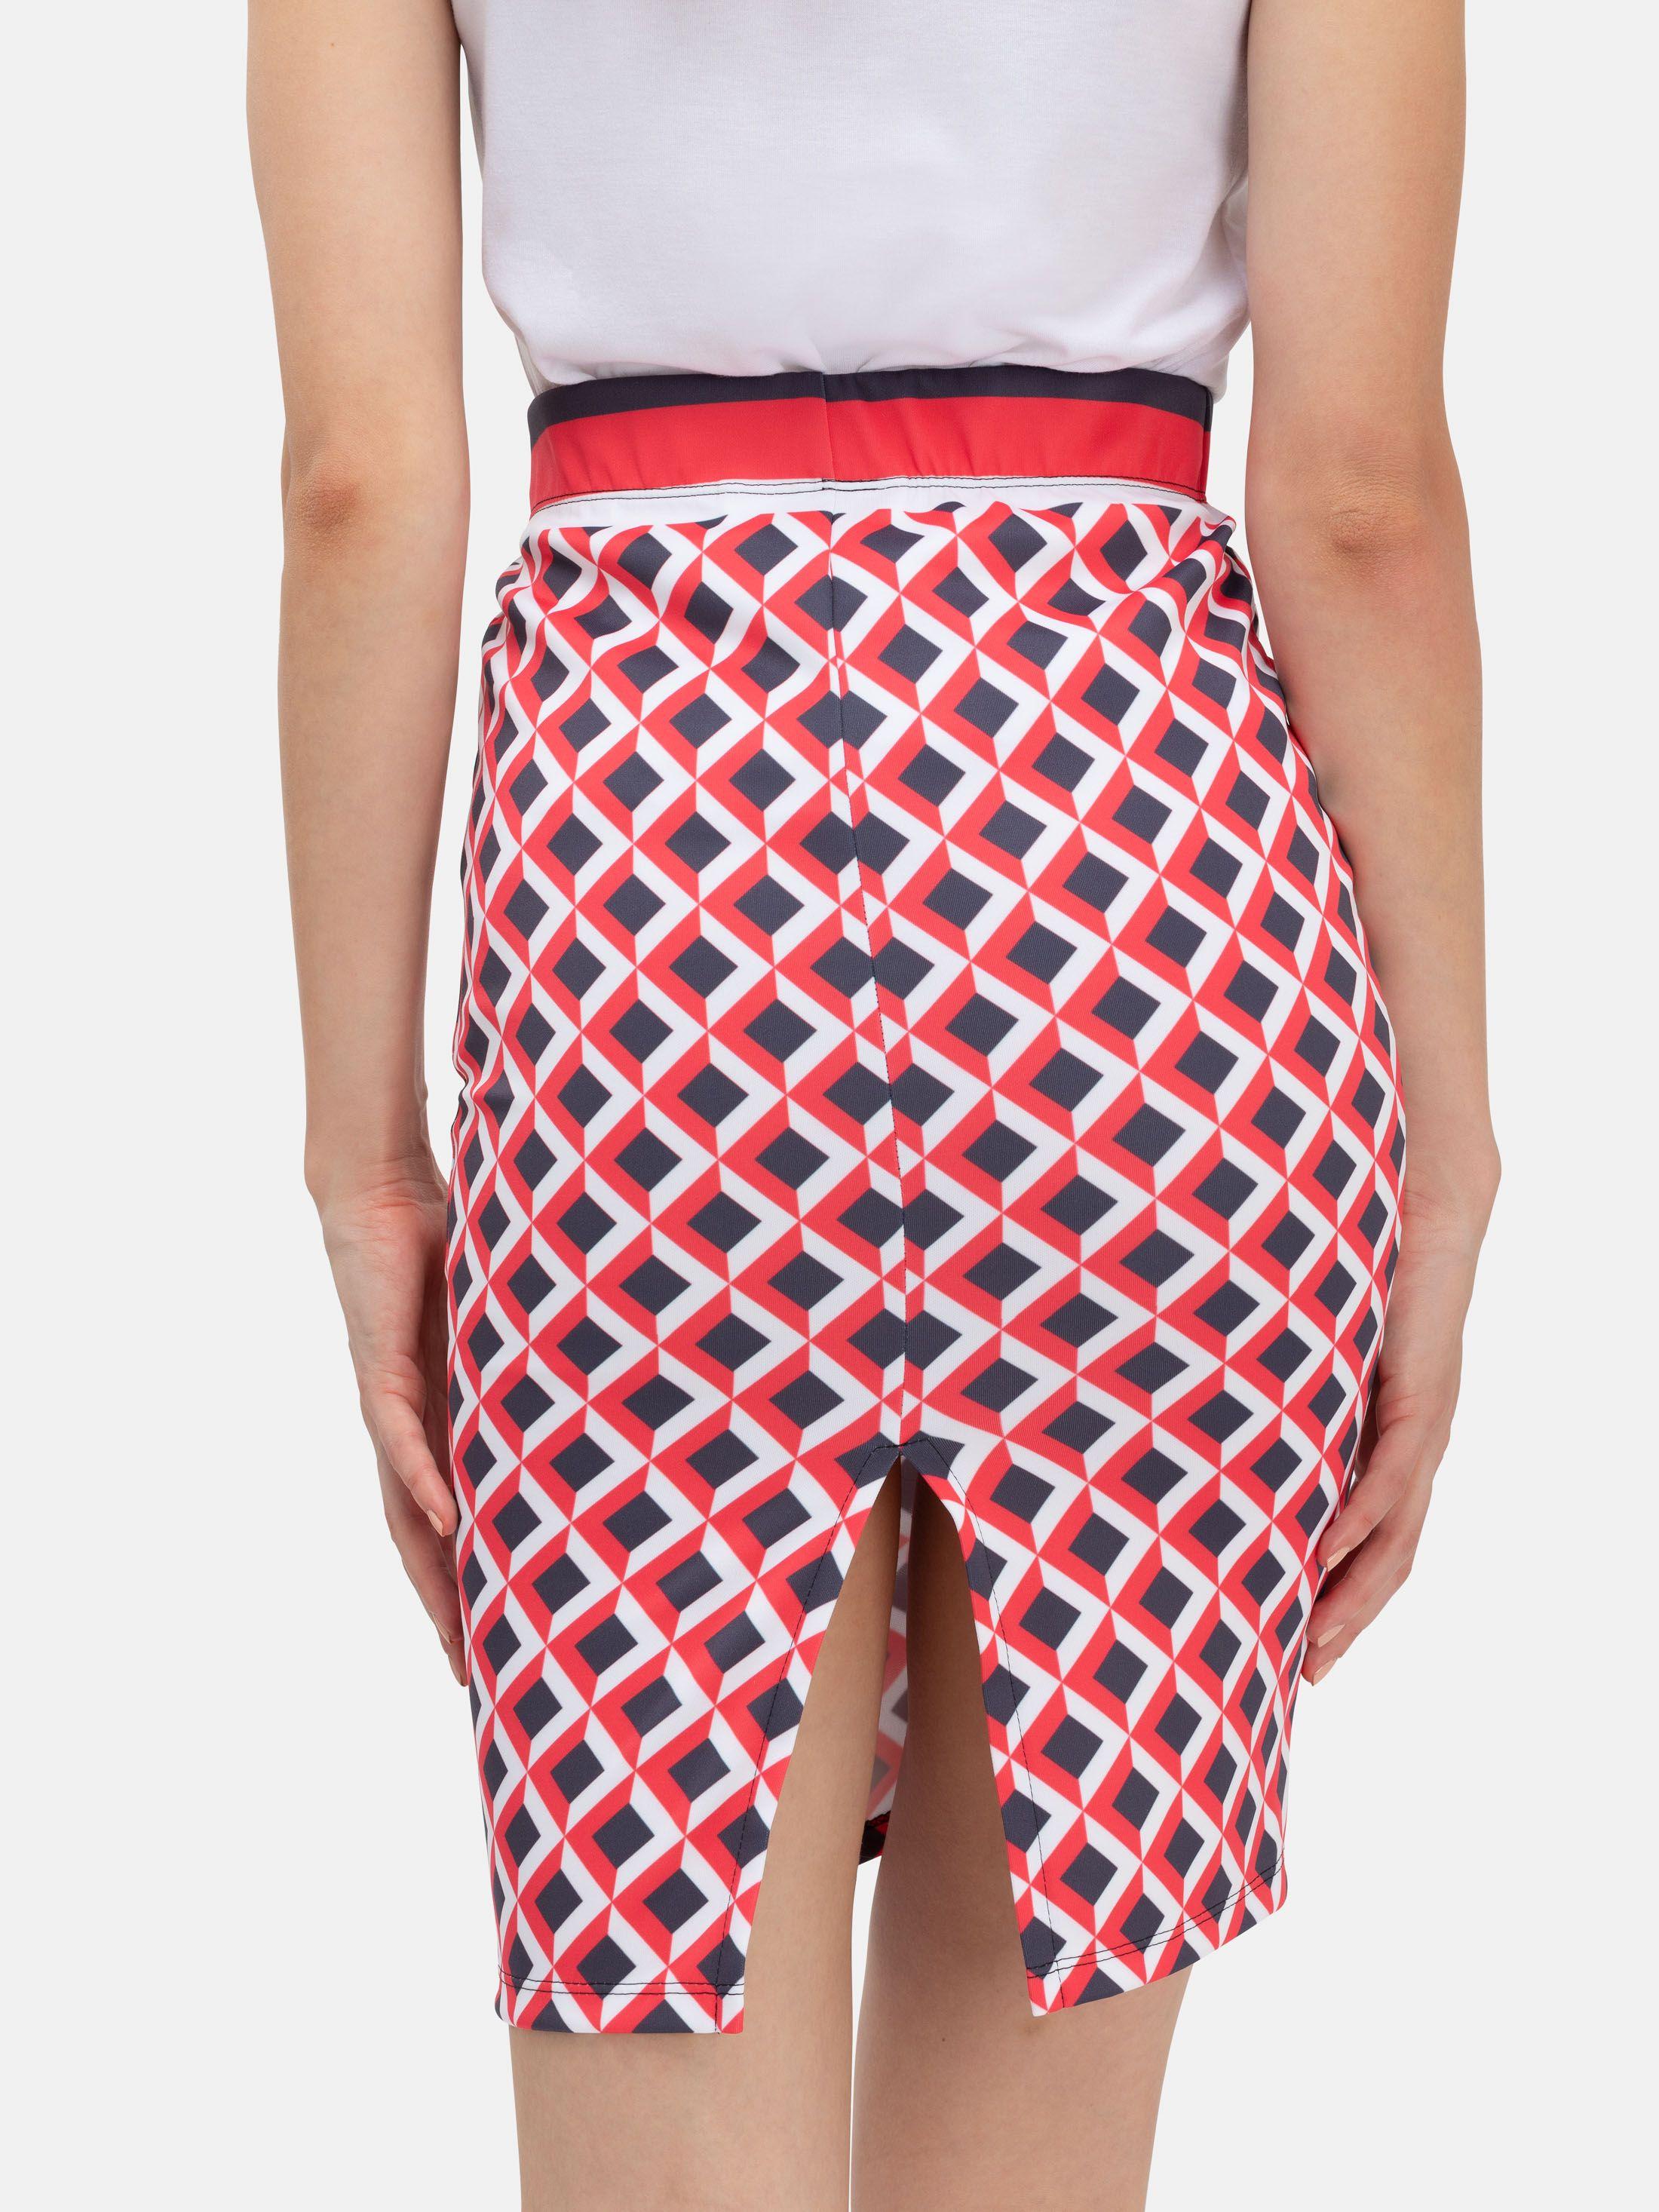 custom design pencil skirts